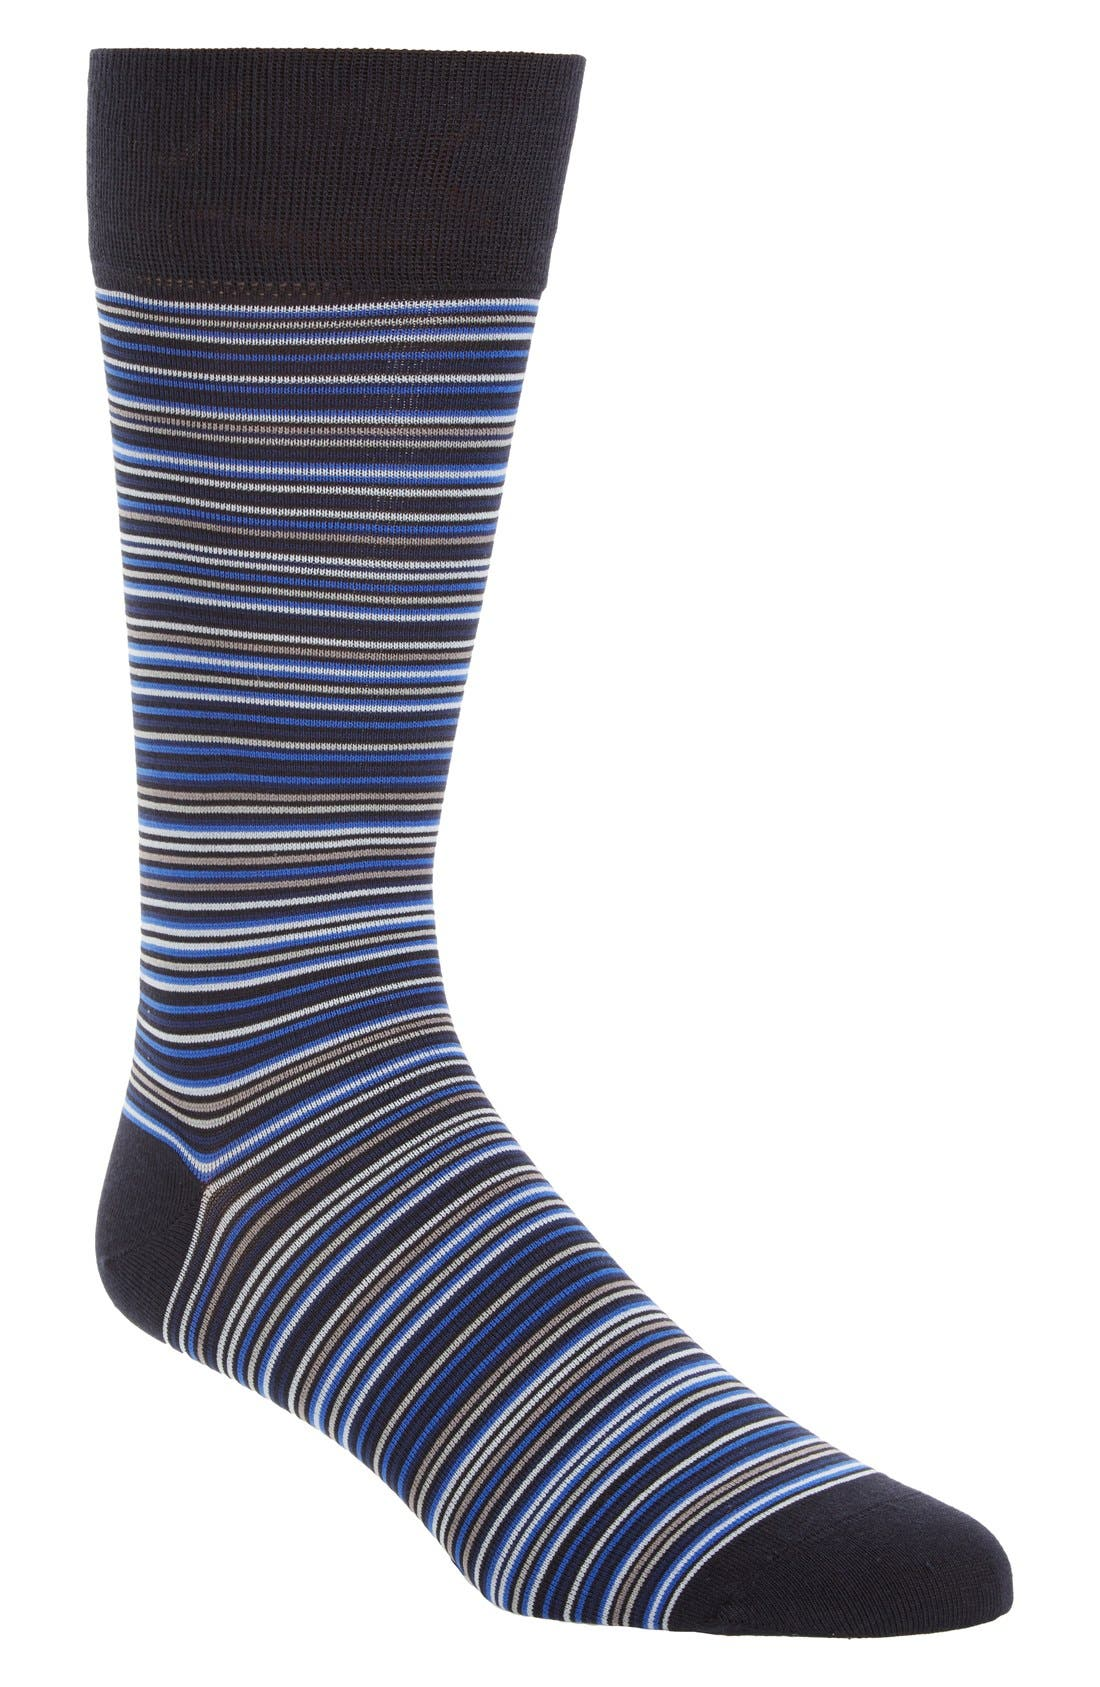 Main Image - Cole Haan Multi Stripe Crew Socks (3 for $30)